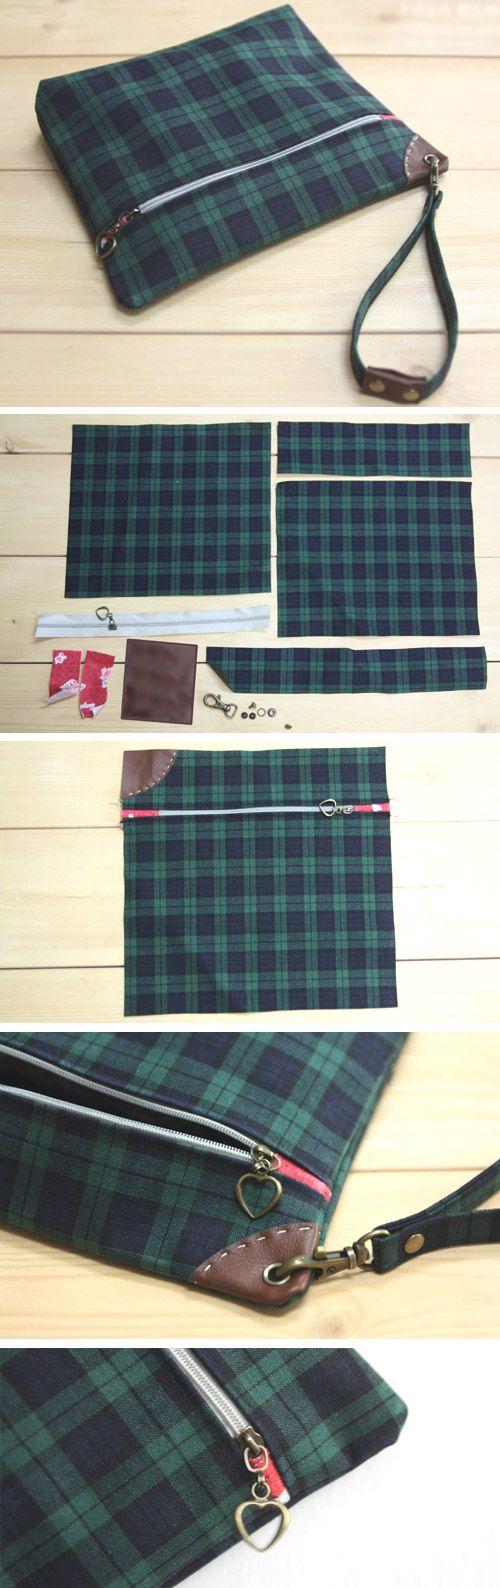 Zippered Pouch with Wrist Strap - Sew DIY Tutorial http://www.handmadiya.com/2015/11/easy-wrist-strap-tutorial.html